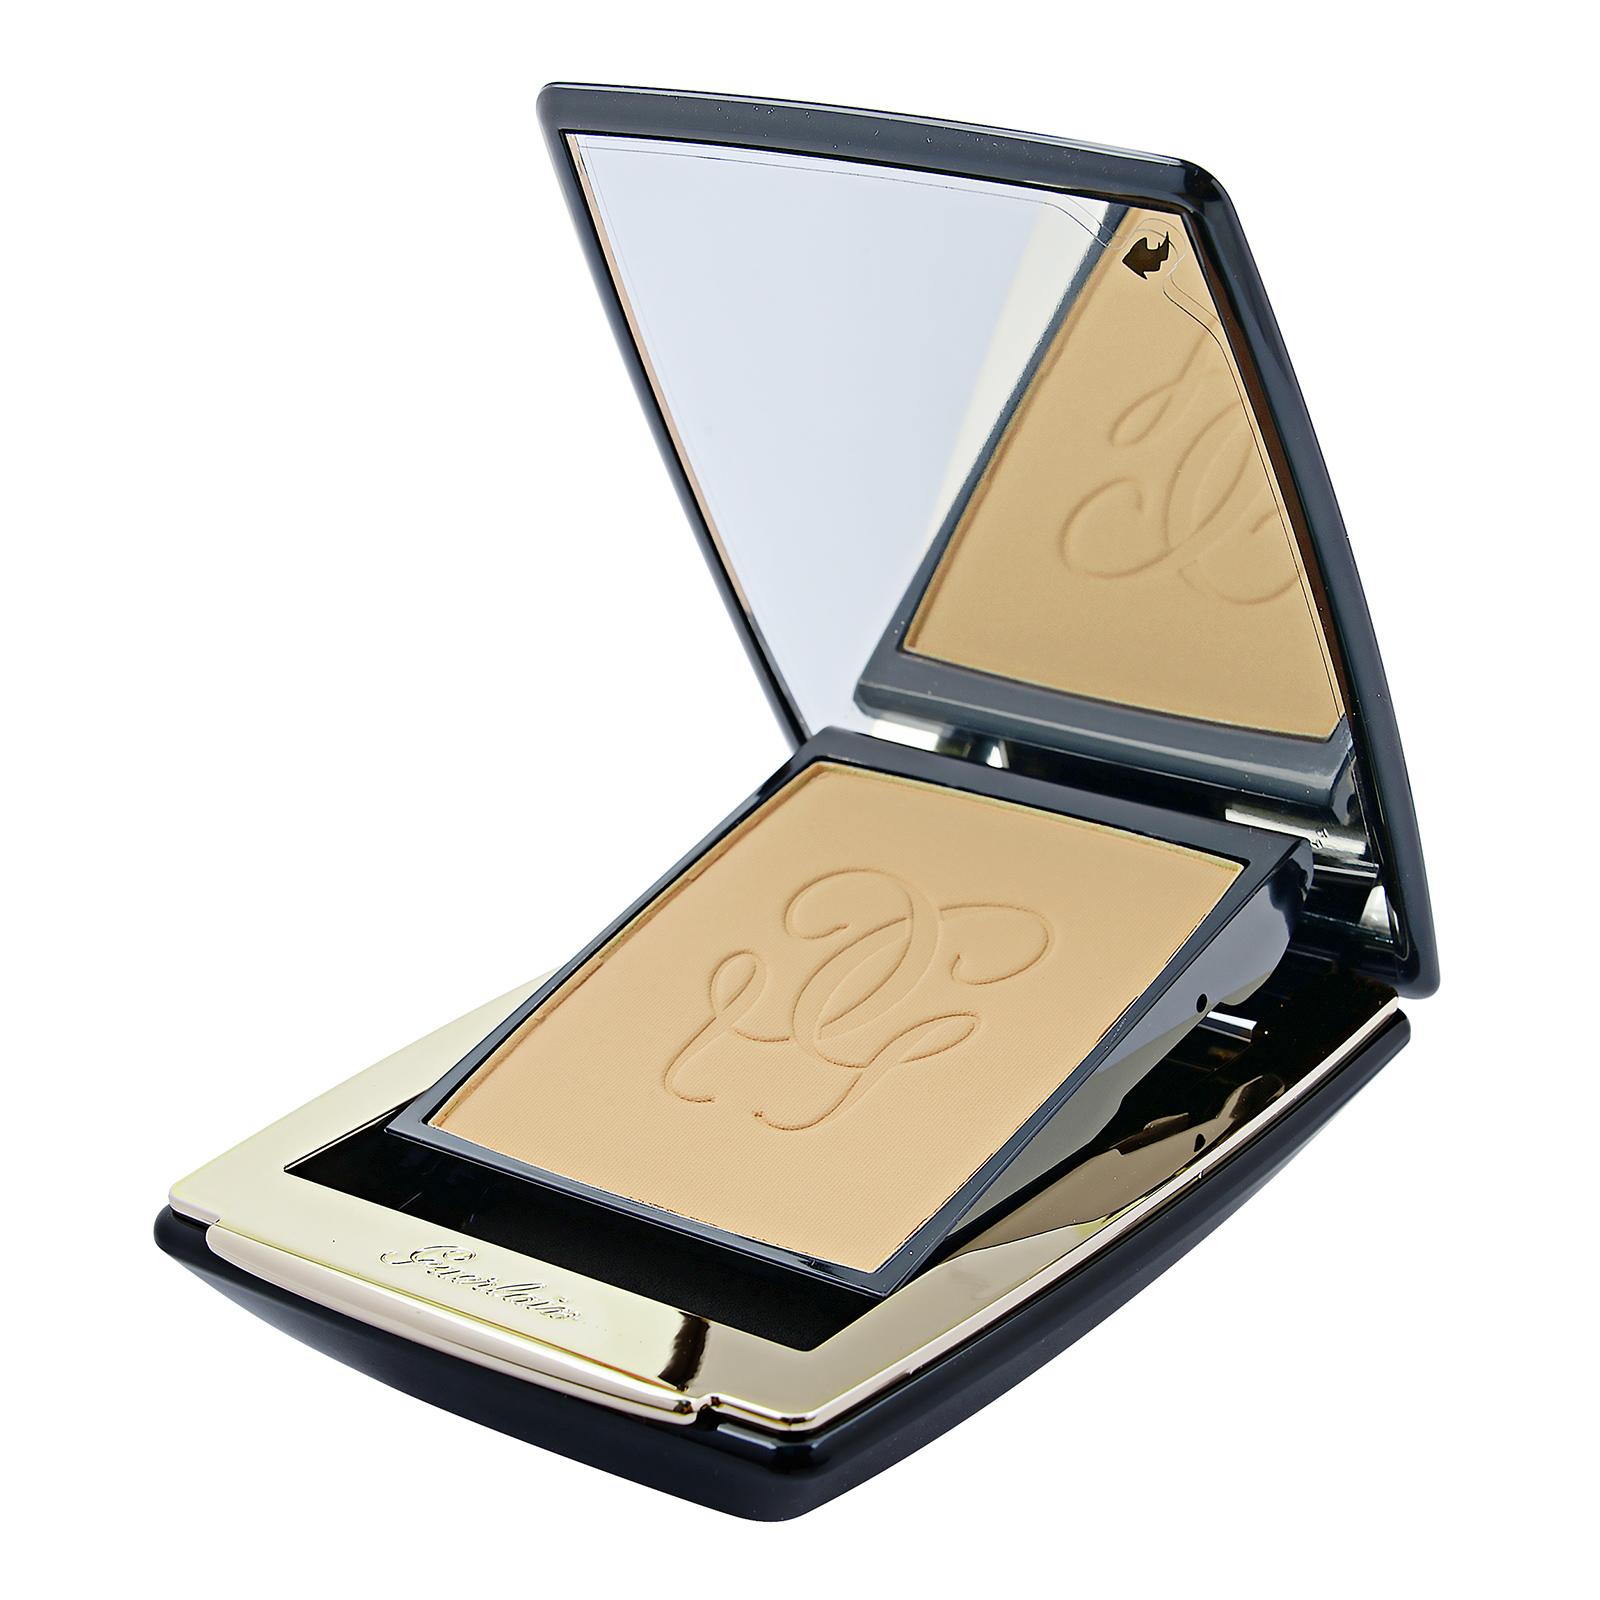 Guerlain Parure Gold Rejuvenating Gold Radiance Powder Foundation 12 Light Rosy, 0.35oz, 10g